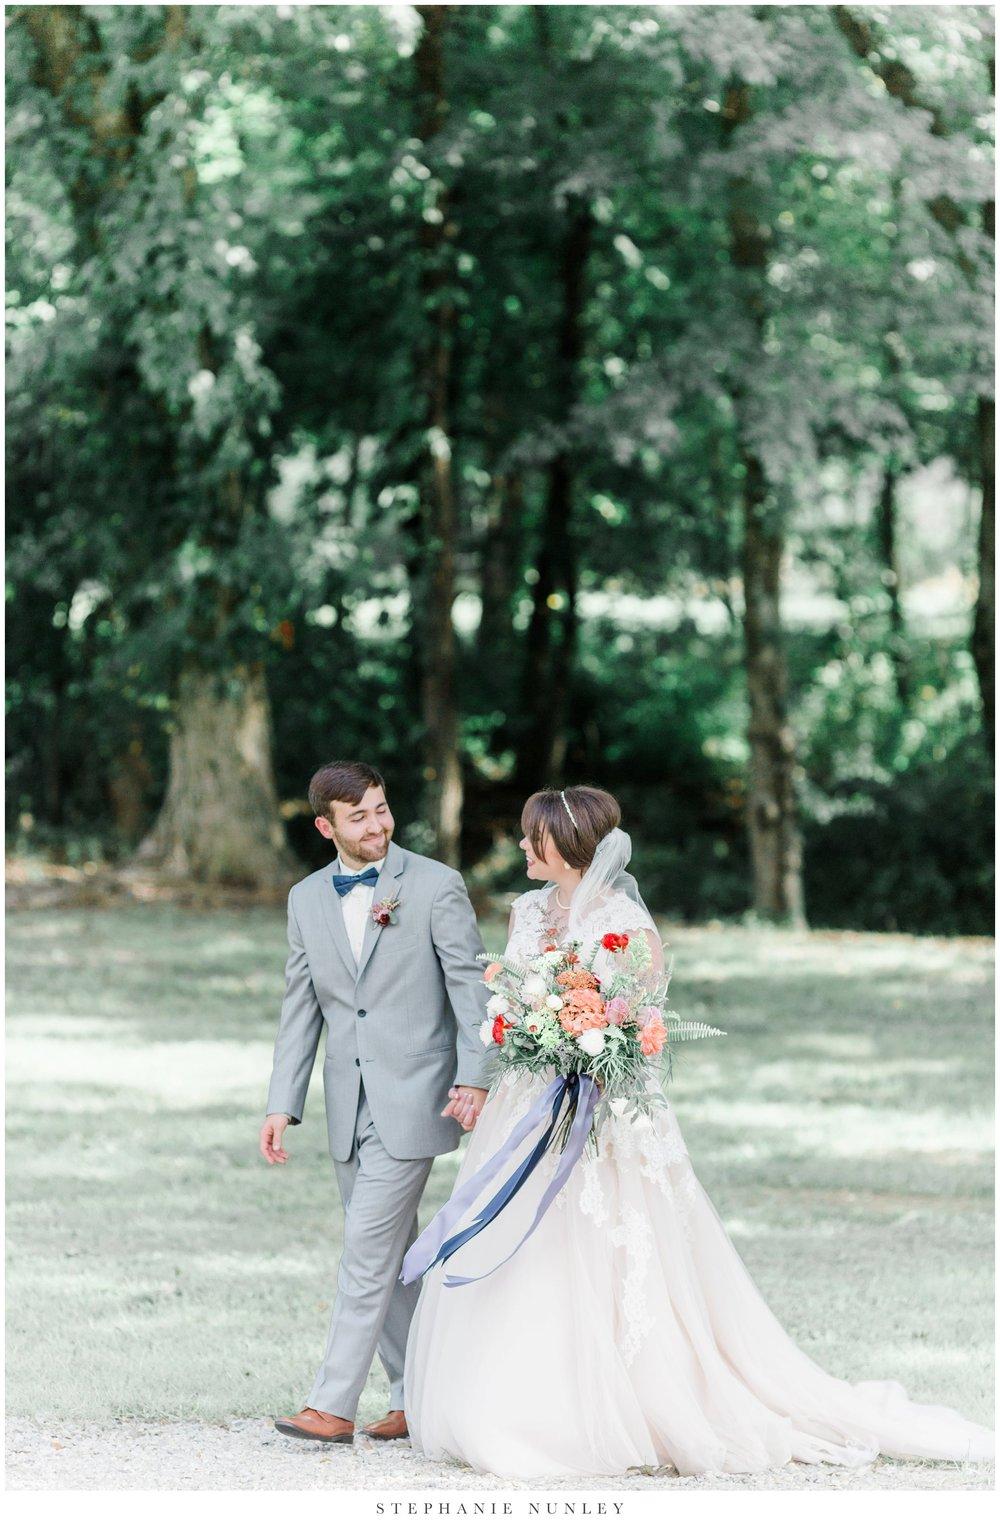 arkansas-wedding-with-lush-wildflower-bouquet-0060.jpg